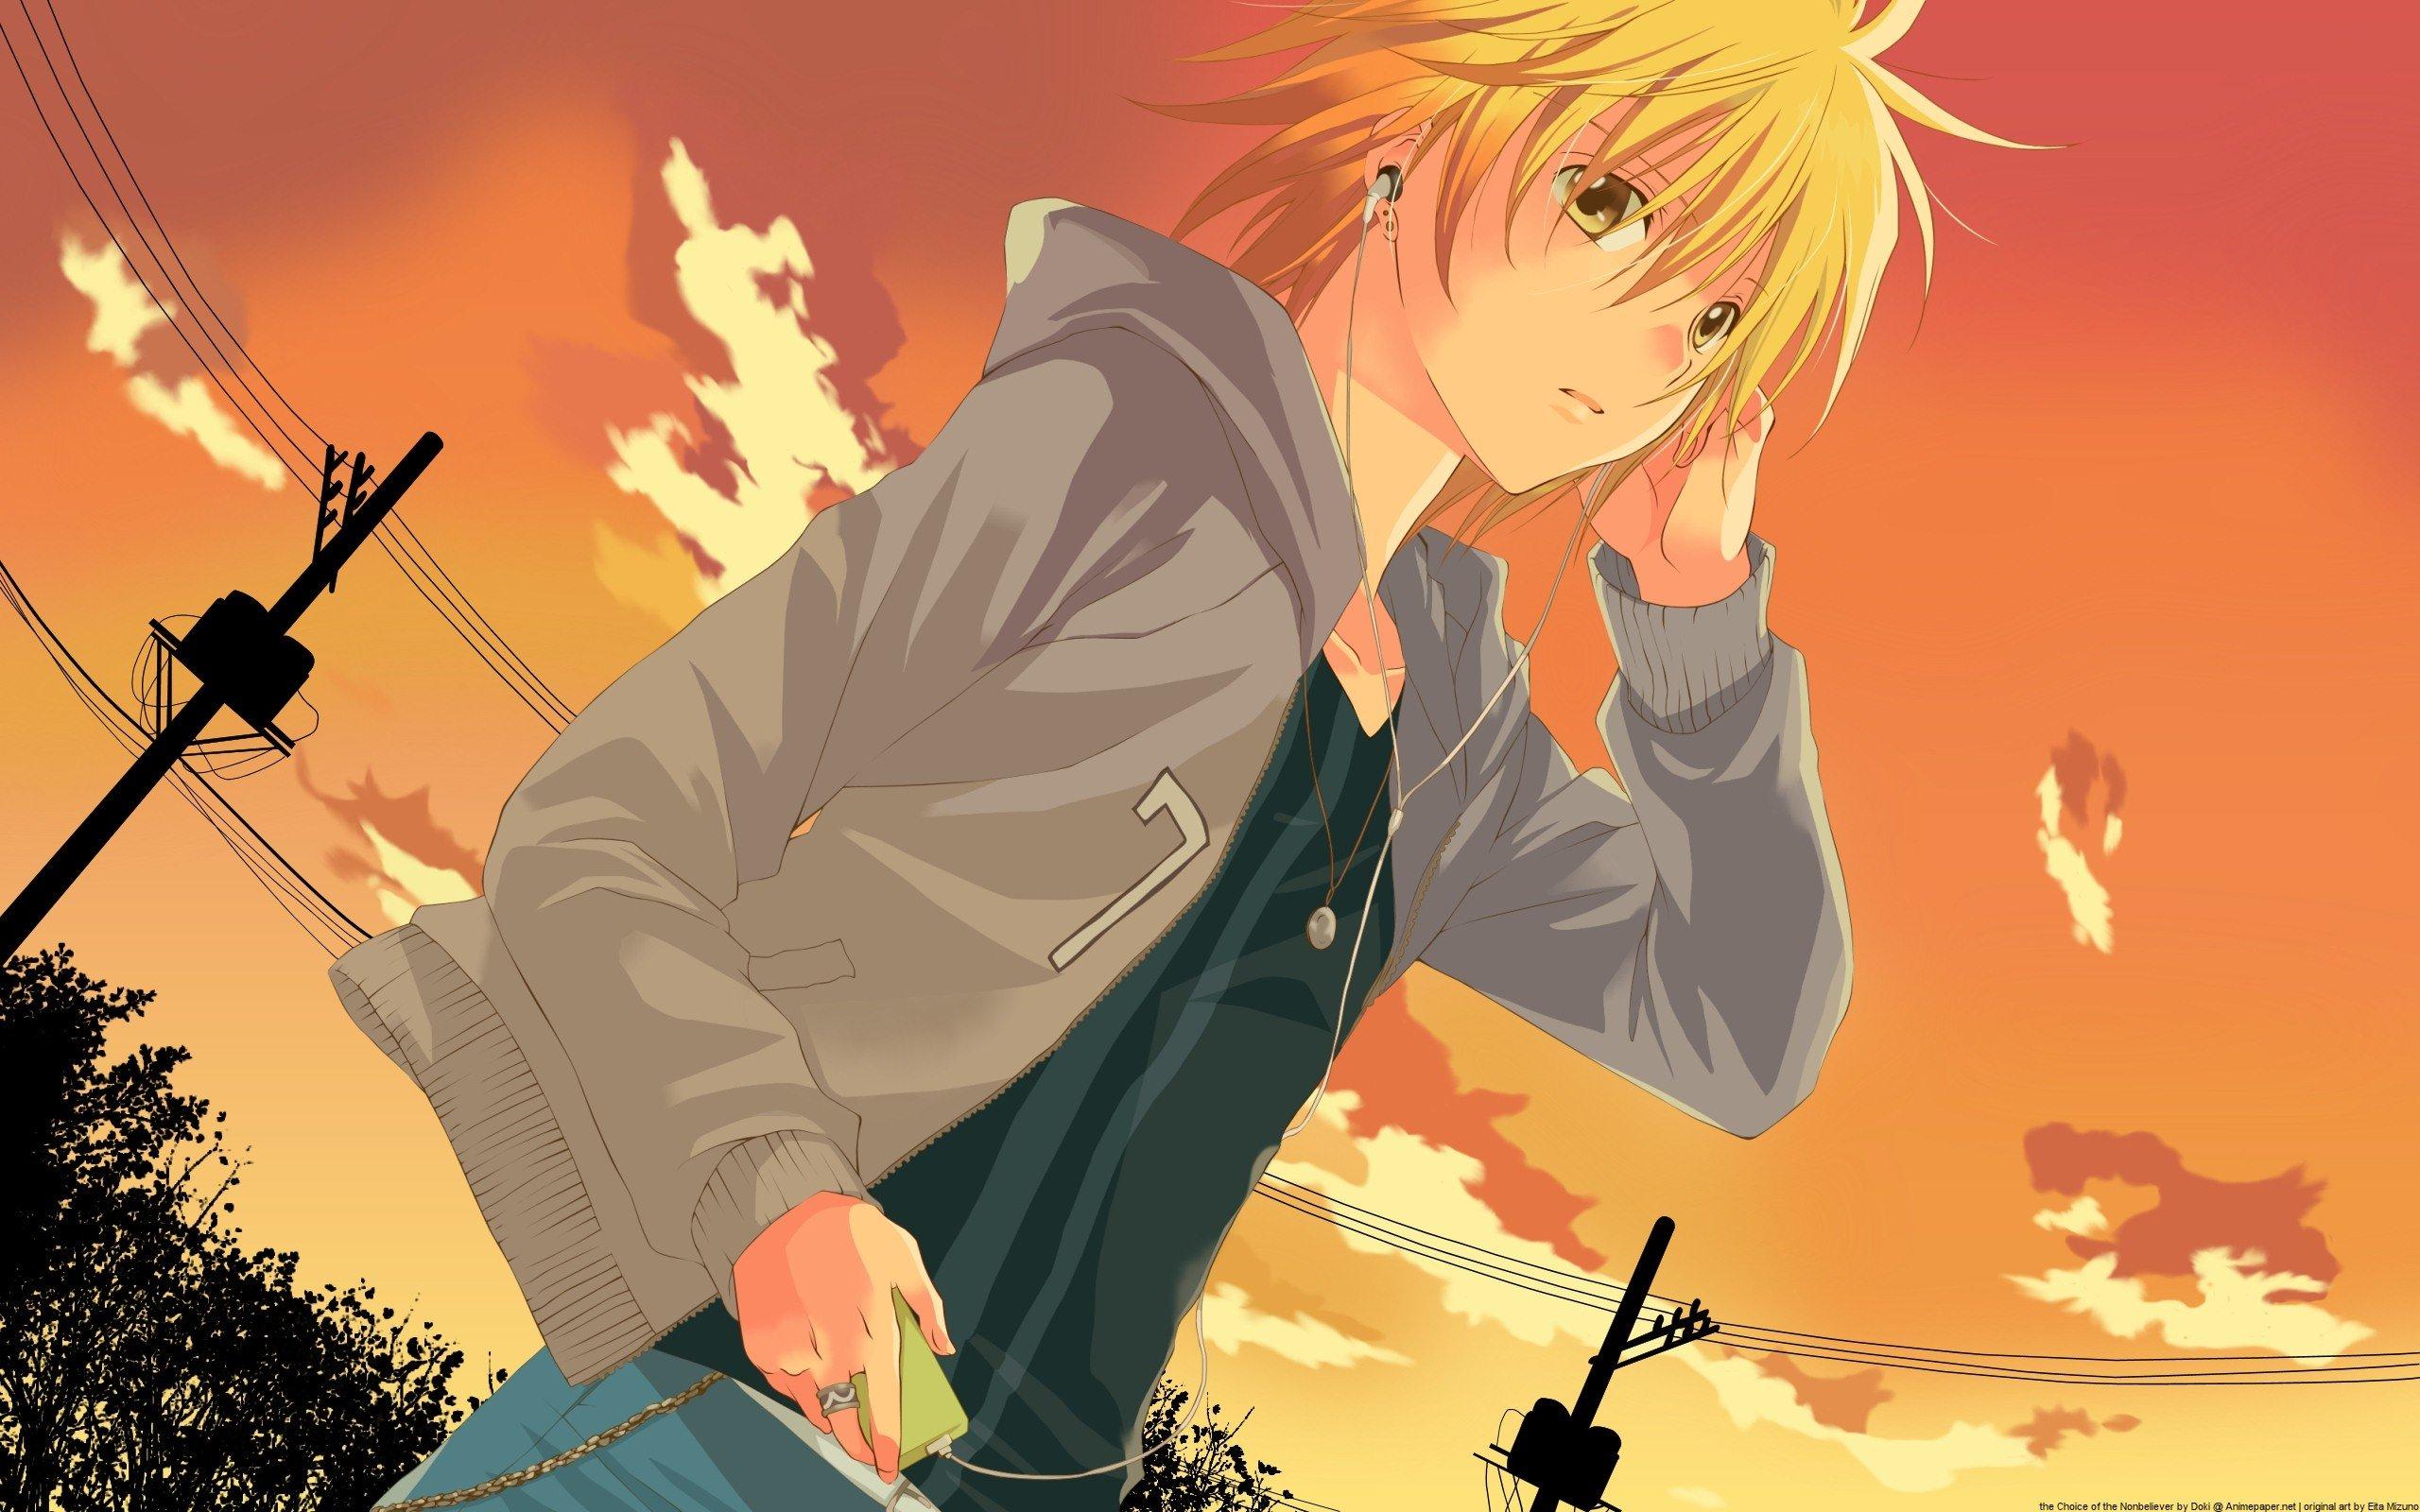 manga, Anime, Anime girls Wallpaper